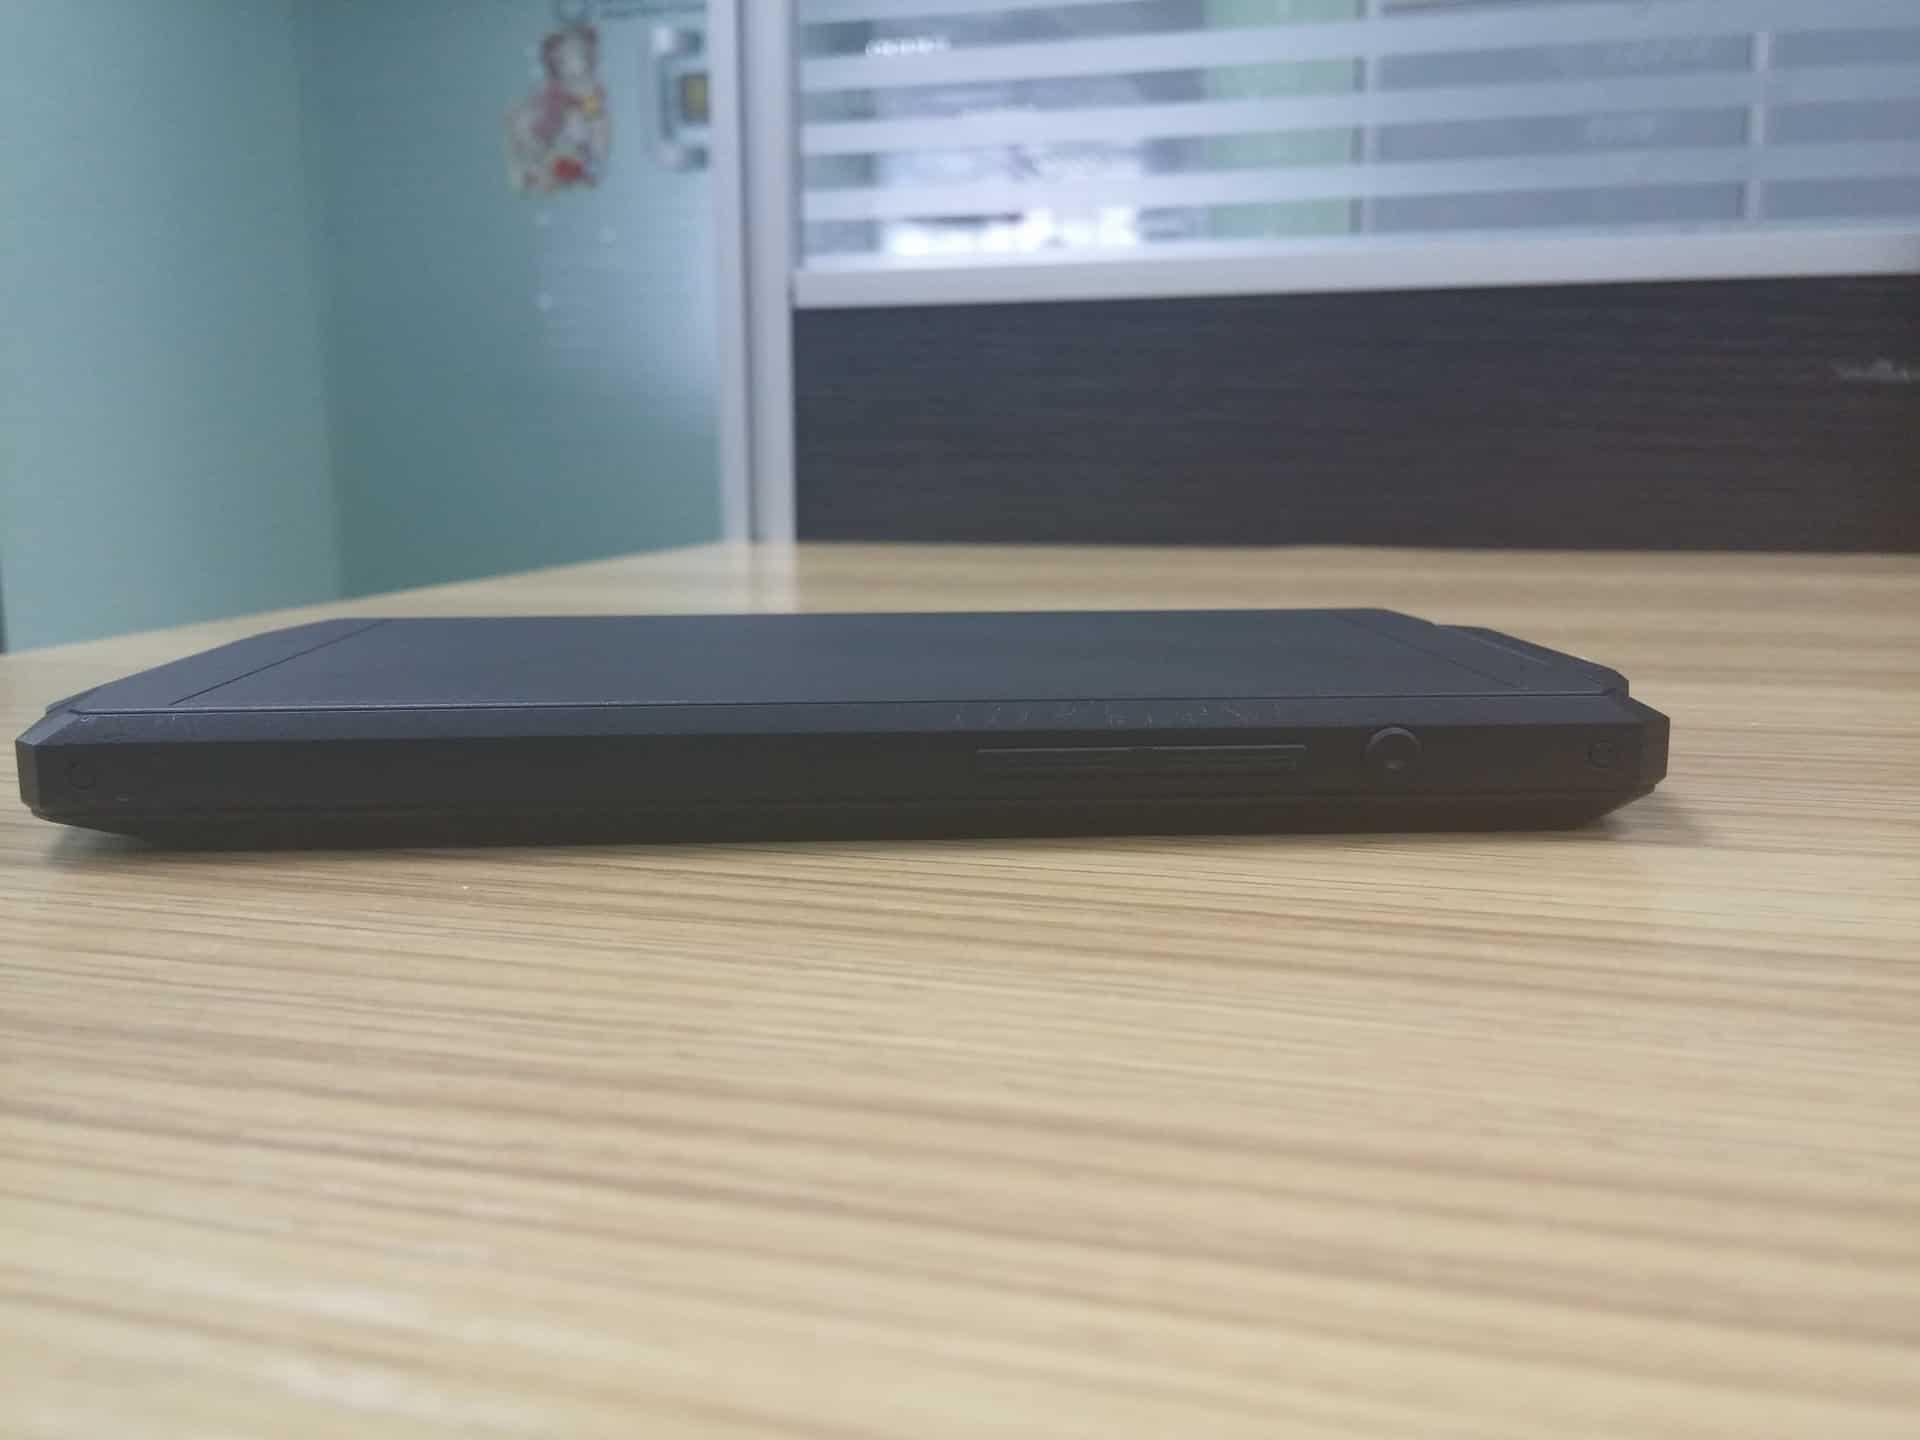 OUKITEL 10000mAh BatteryAndroid 5.1 Smartphone - Right - Imgur